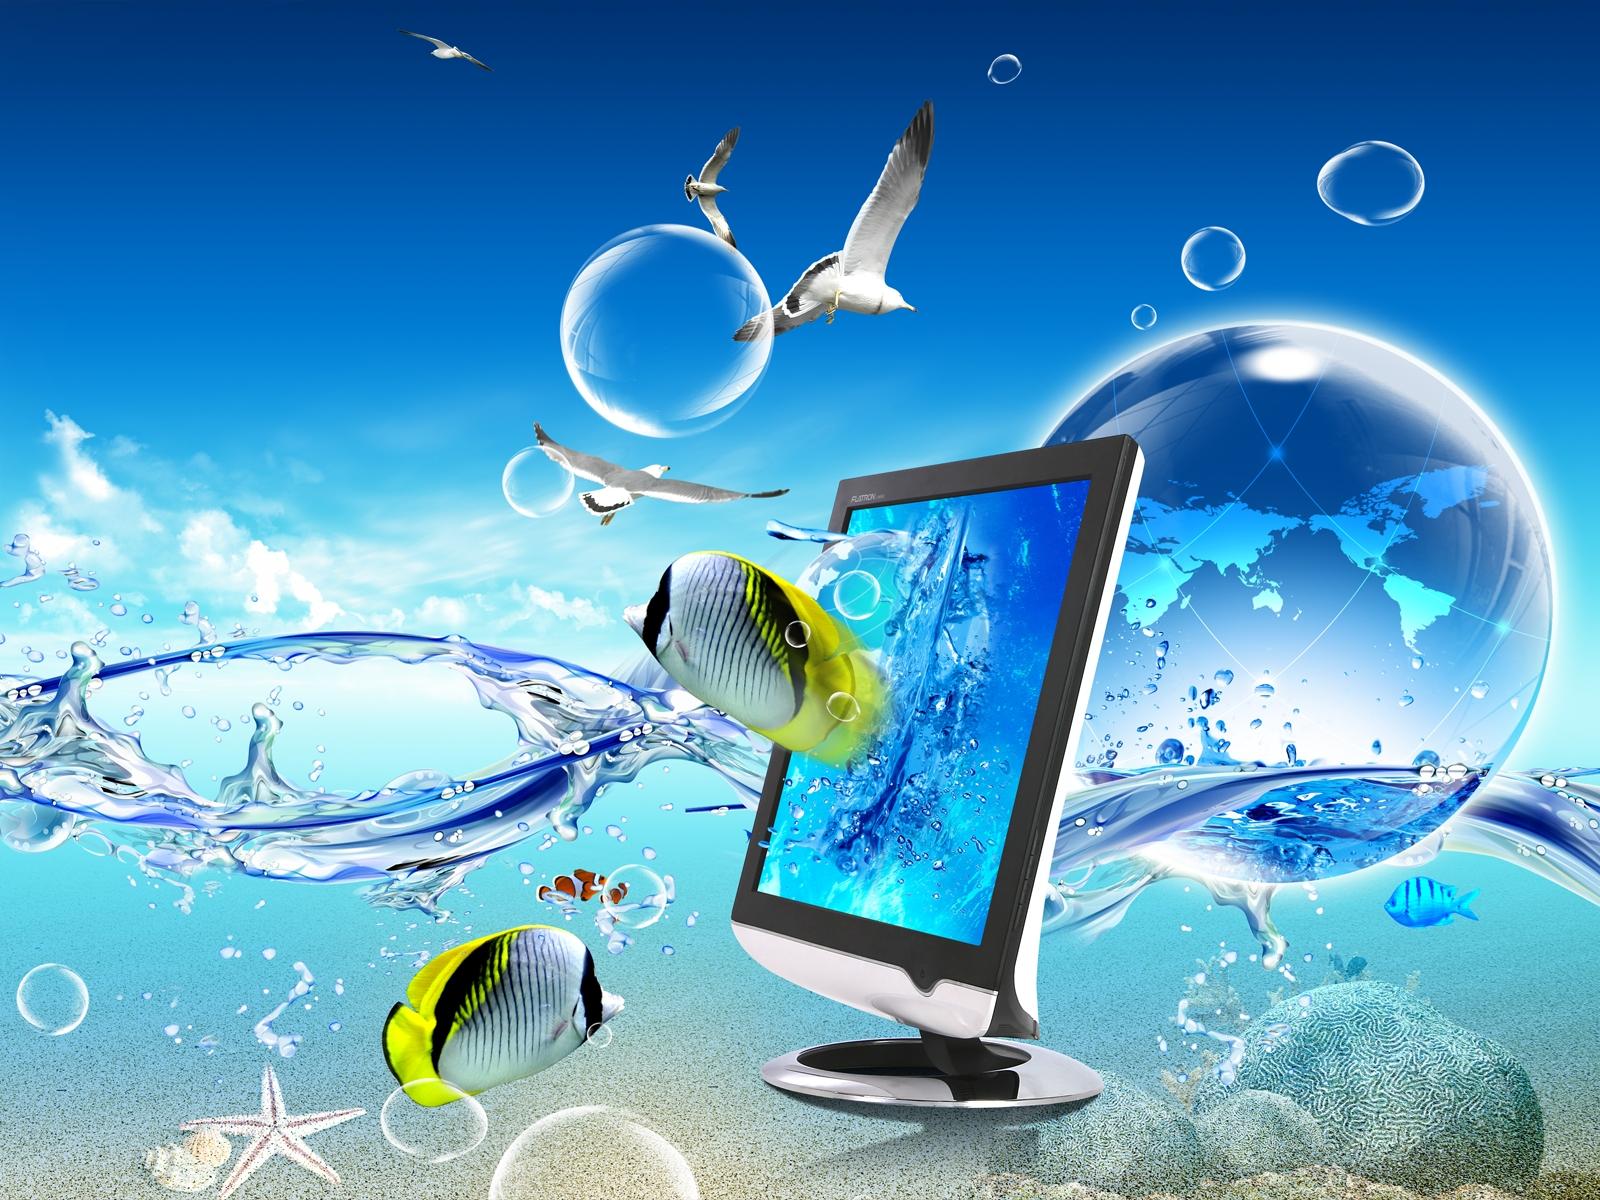 http://1.bp.blogspot.com/-RIyqCJU380s/UOMj7fYmMeI/AAAAAAAABFA/kioBT4_VWG0/s1600/fantasy_desktop-normal.jpg